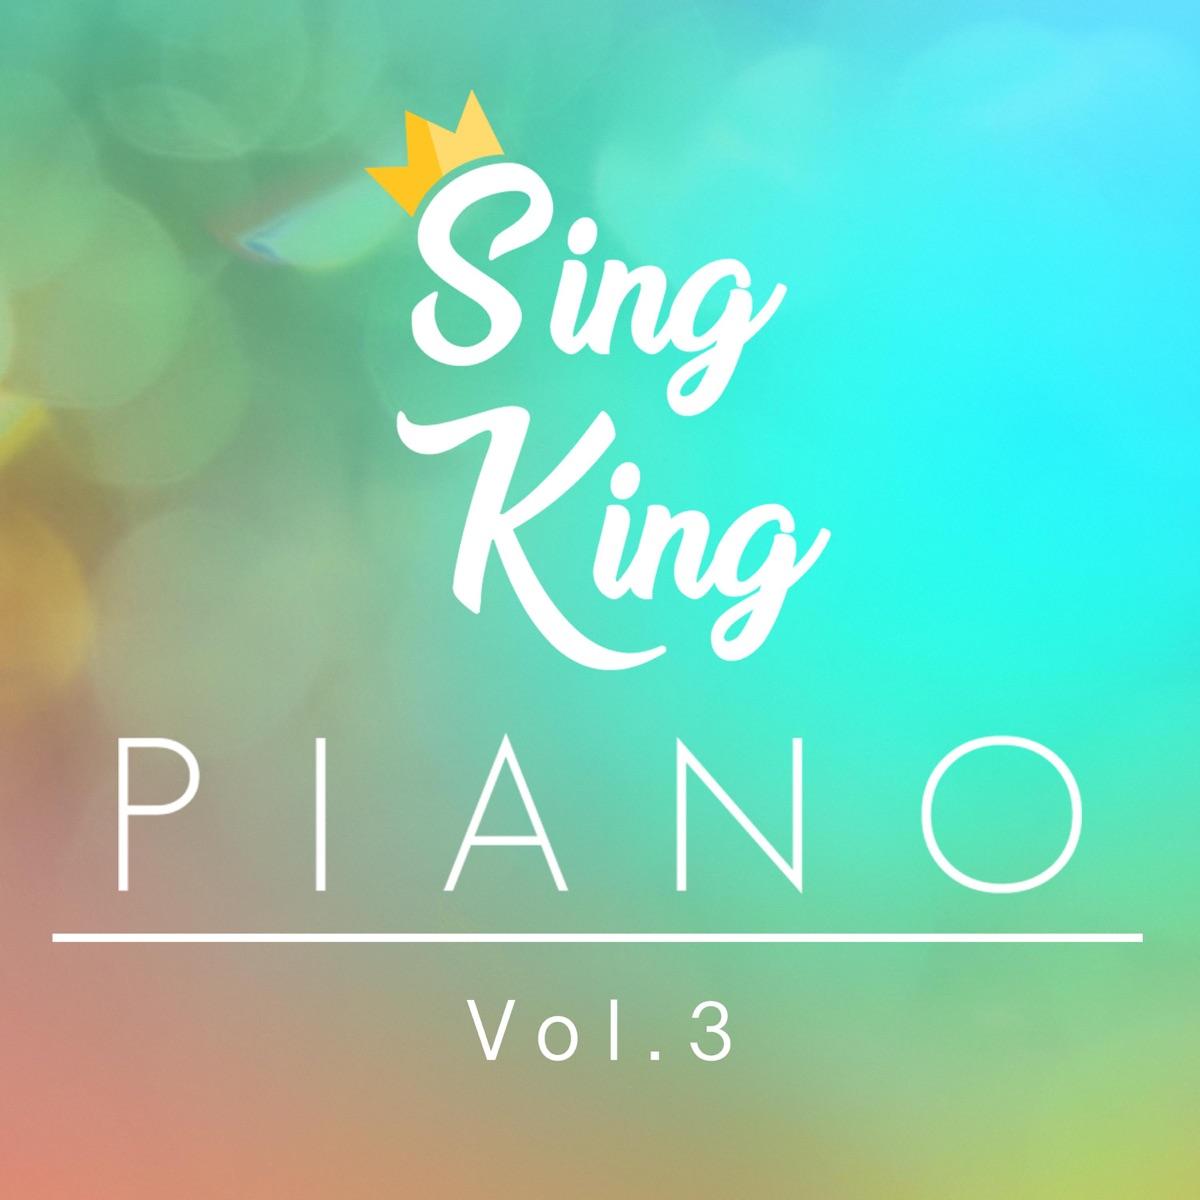 Piano Vol 3 Piano Version Sing King CD cover